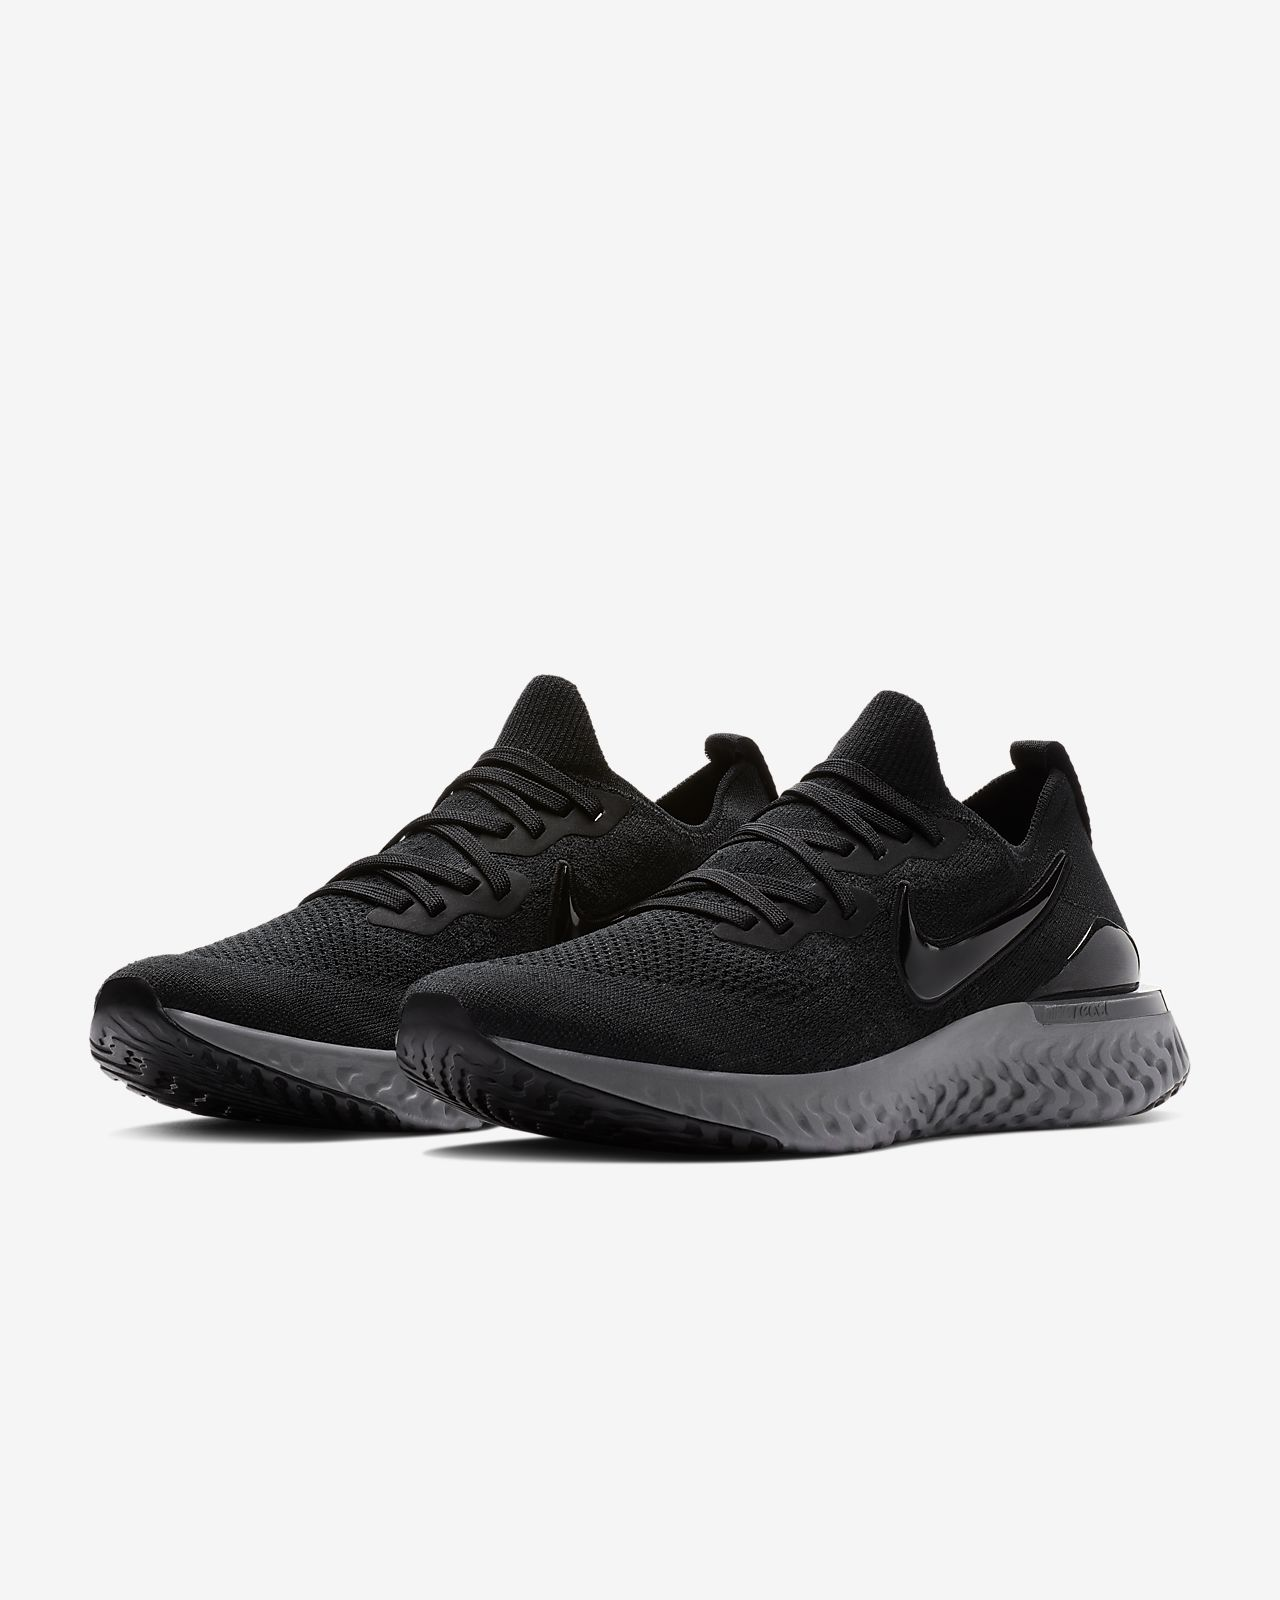 brand new d33e0 db273 ... Nike Epic React Flyknit 2 Zapatillas de running - Hombre